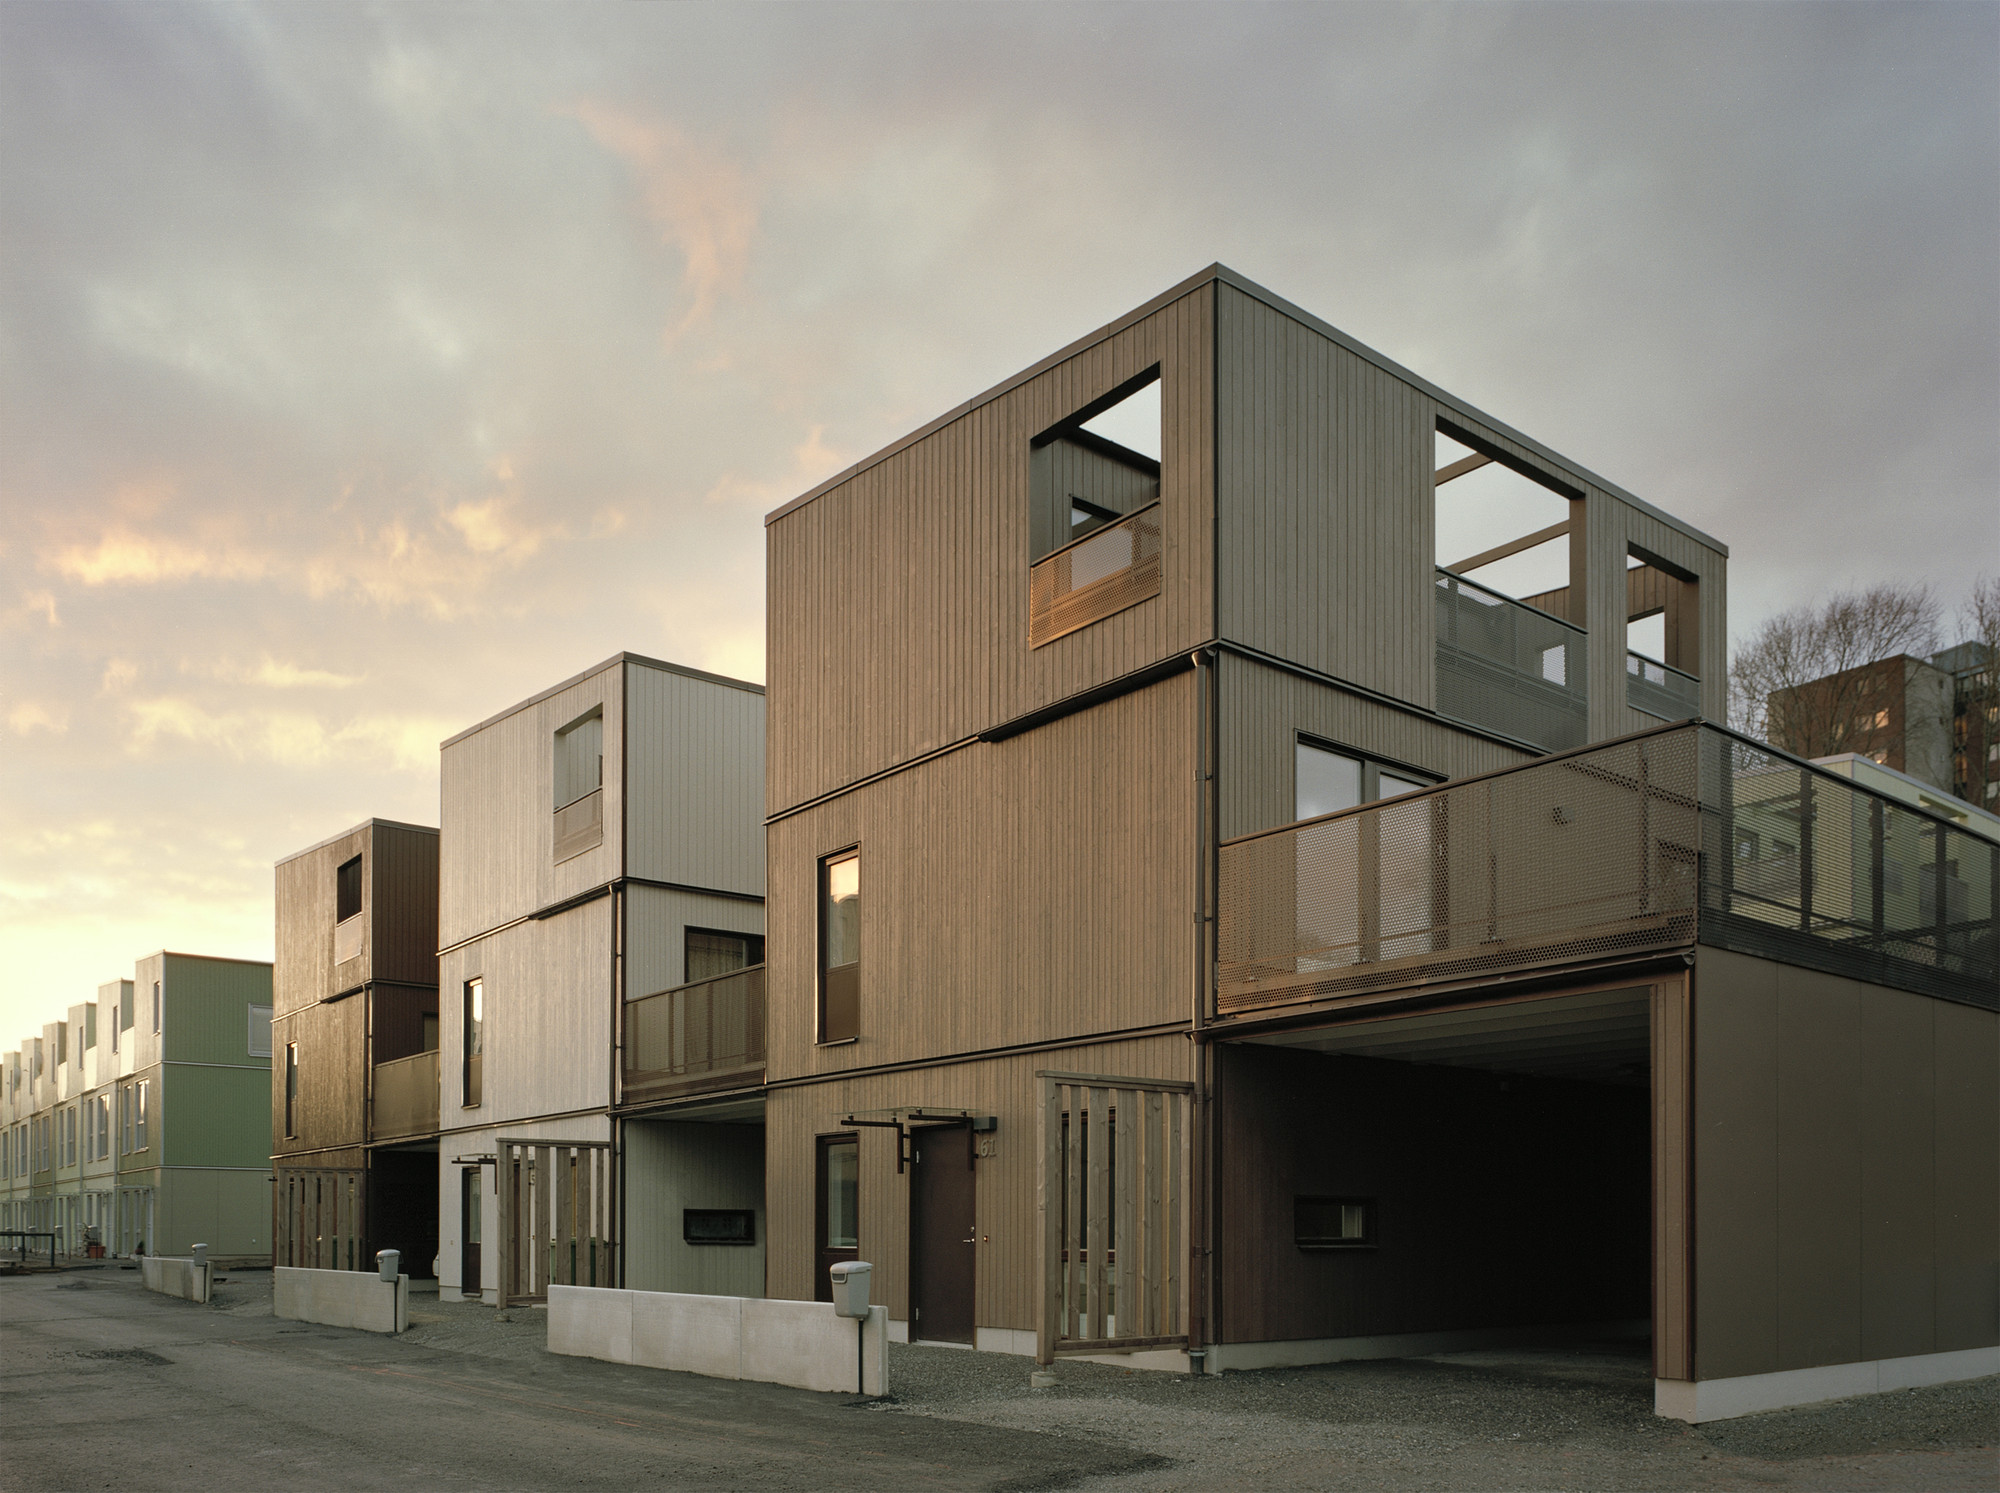 Terrazas Fittja / Kjellander + Sjöberg Architects , © Johan Fowelin